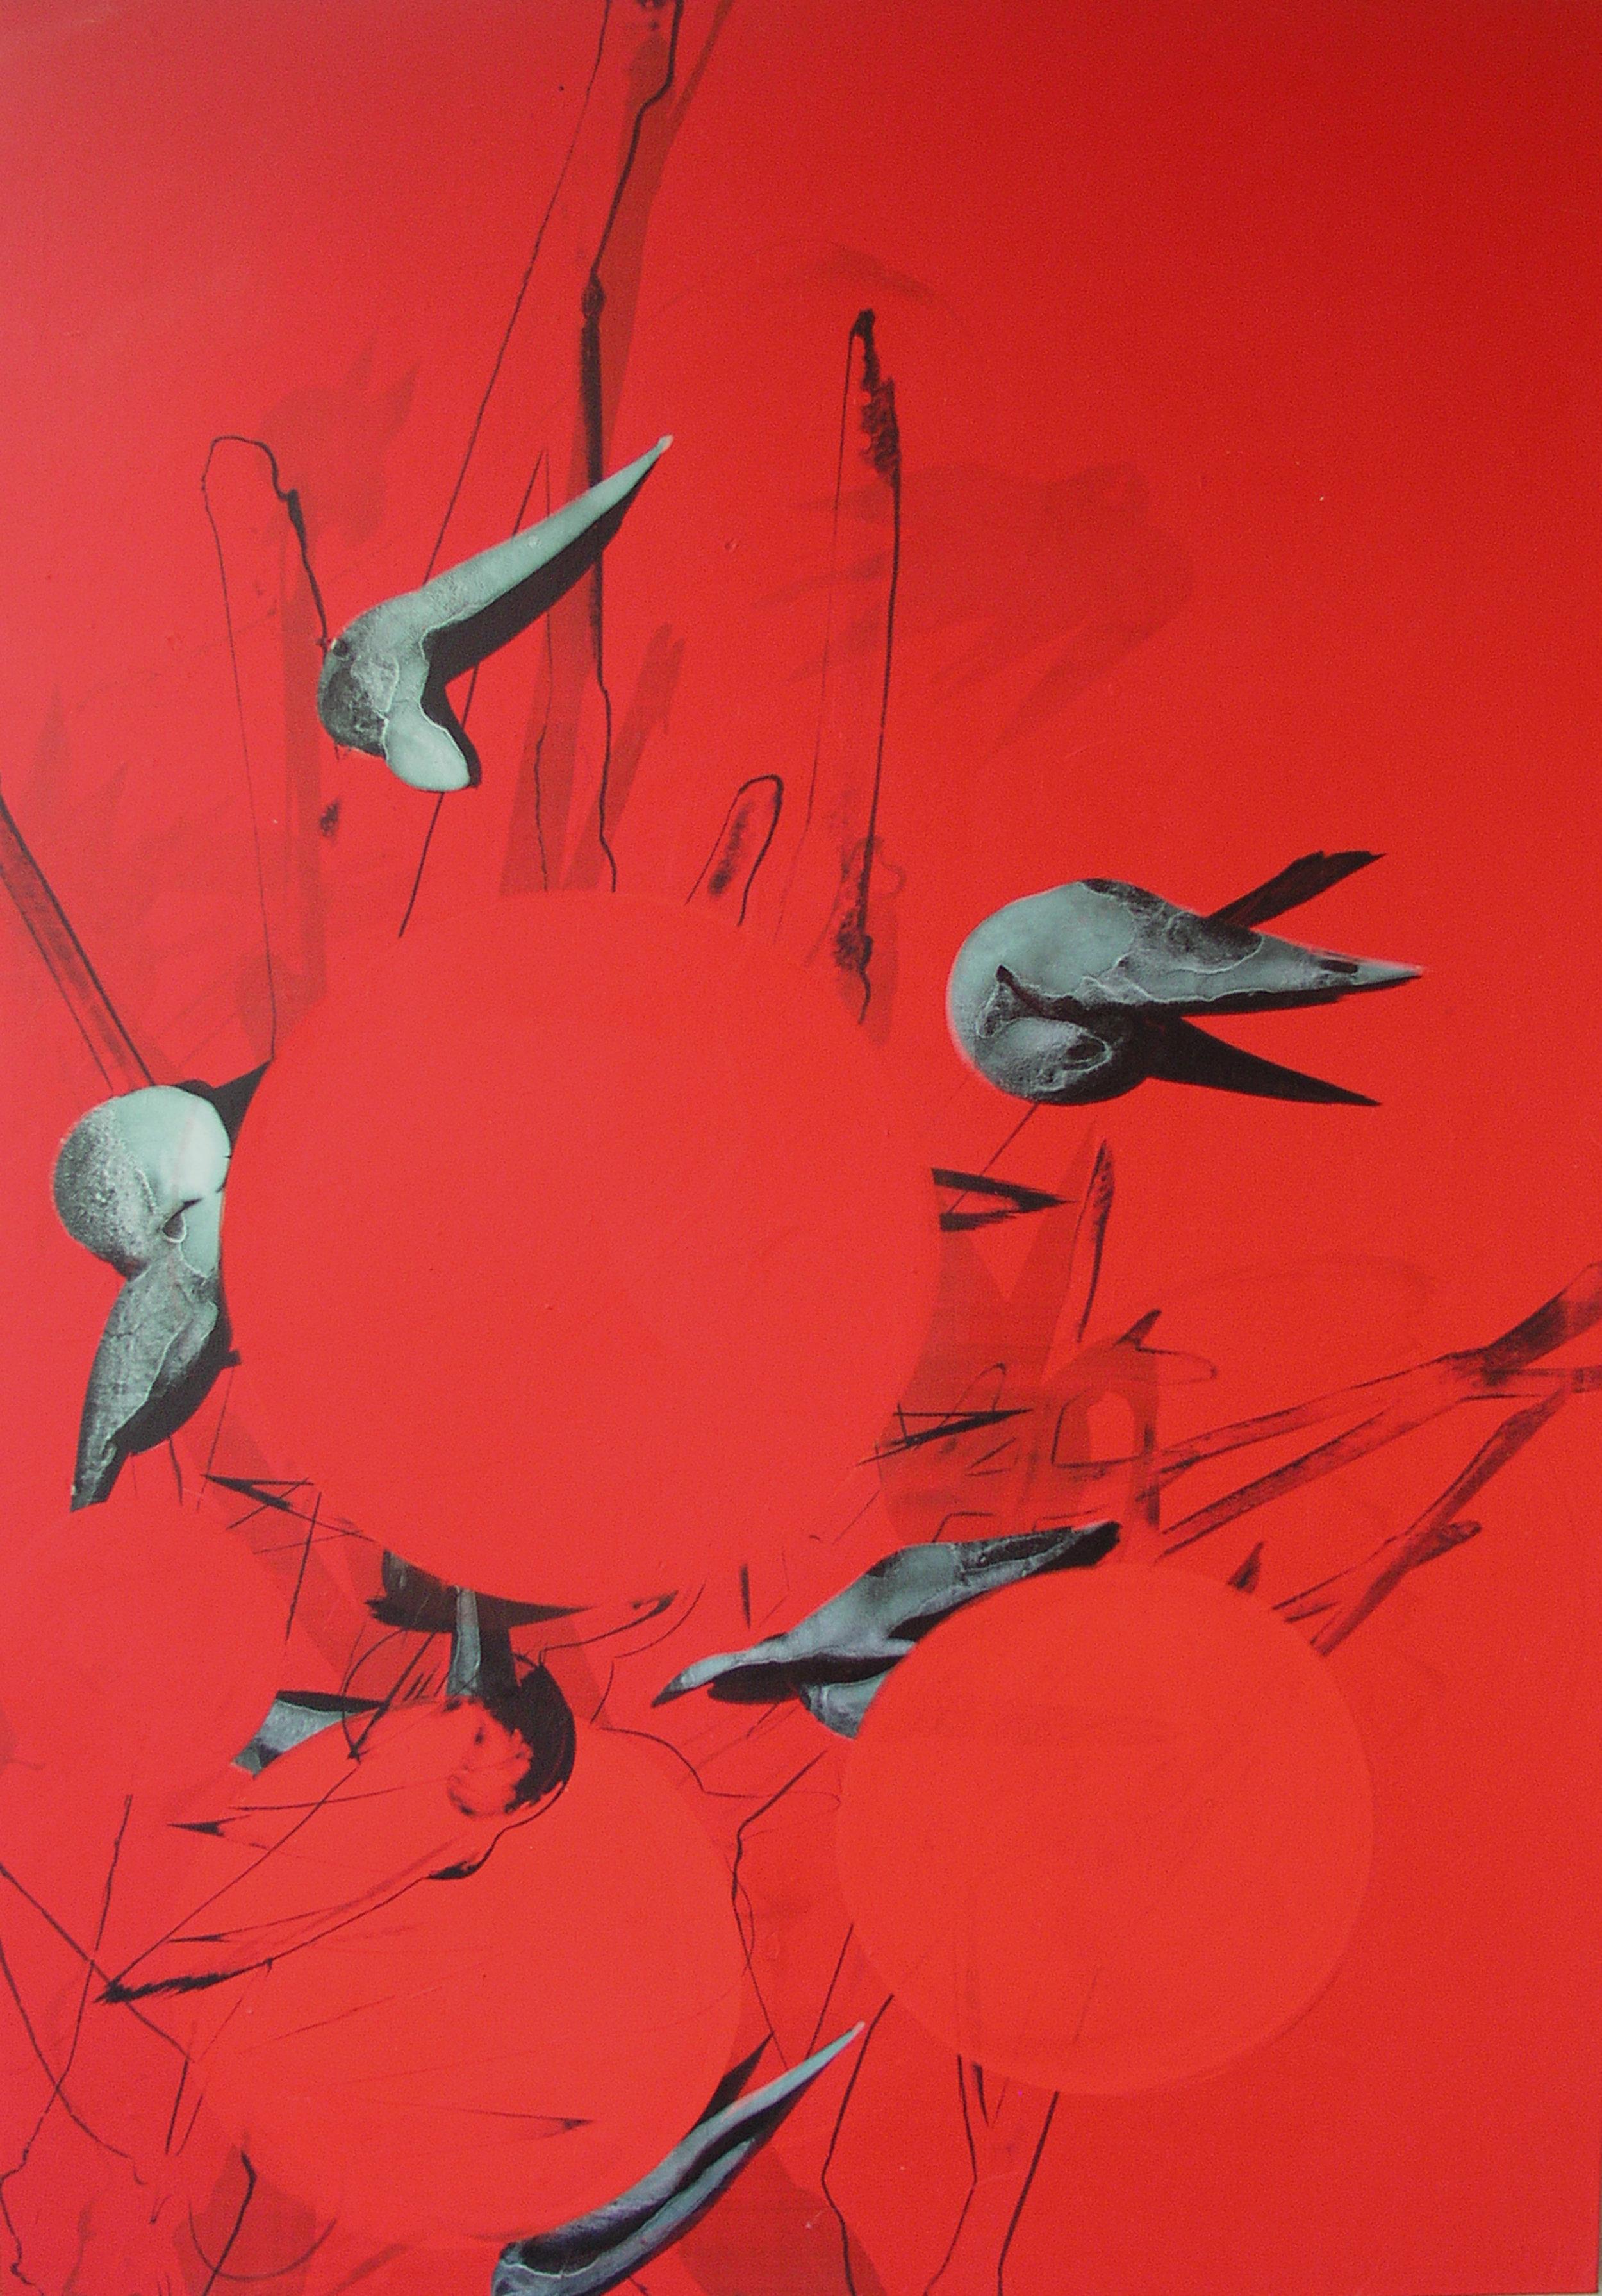 SoHyun Bae, PB Geometry, 2007, acrylic on canvas, 100 x 70 cm